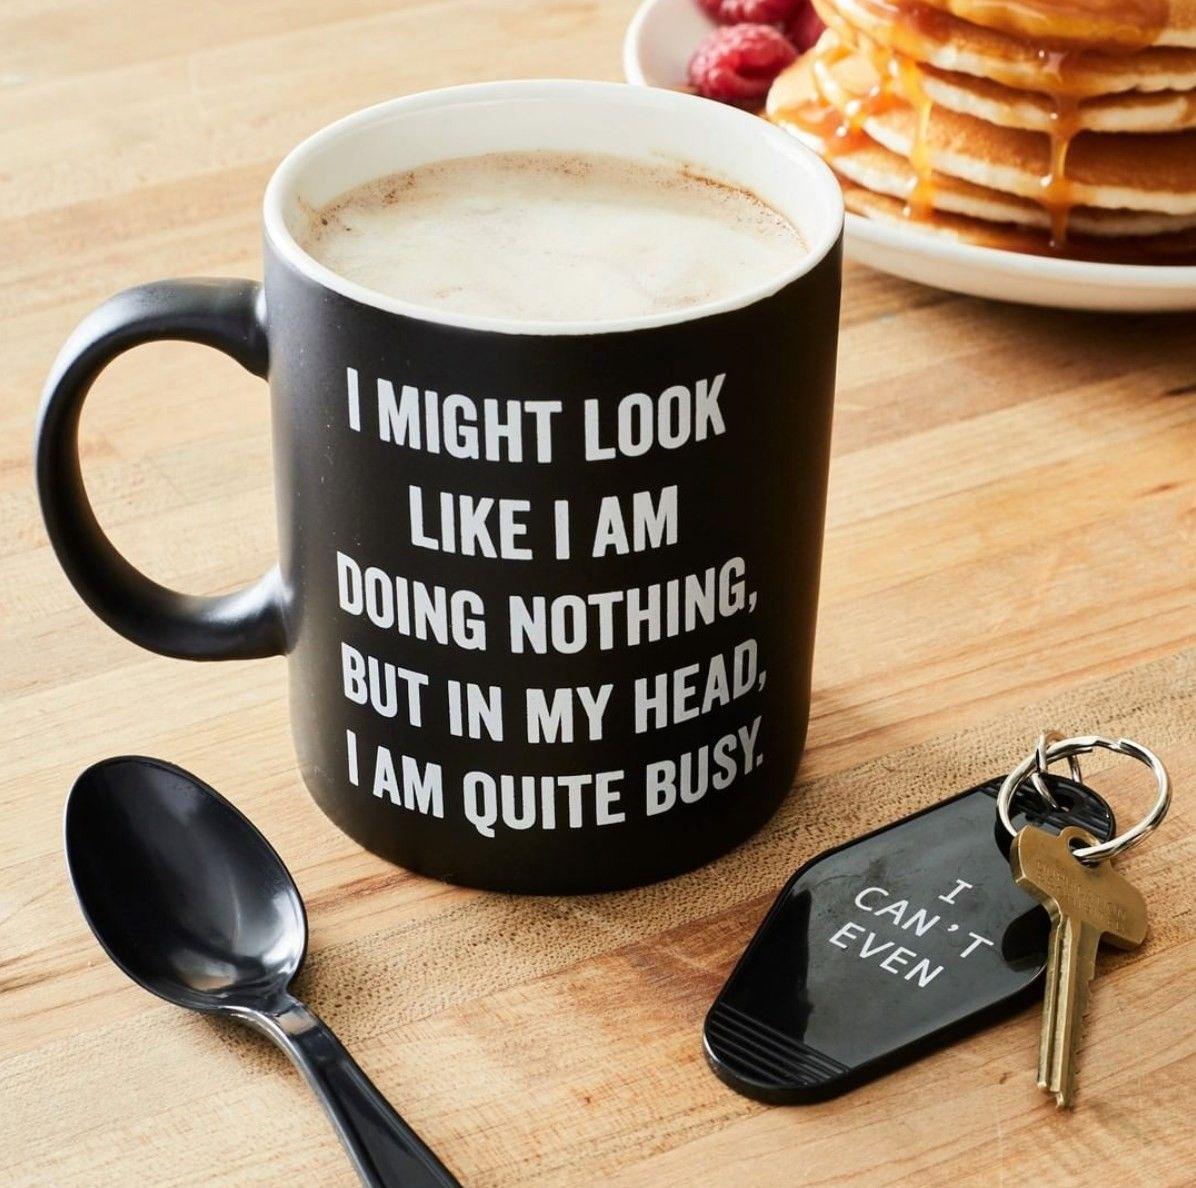 Image by Sheri Powell on Sooo me Sunday coffee, But